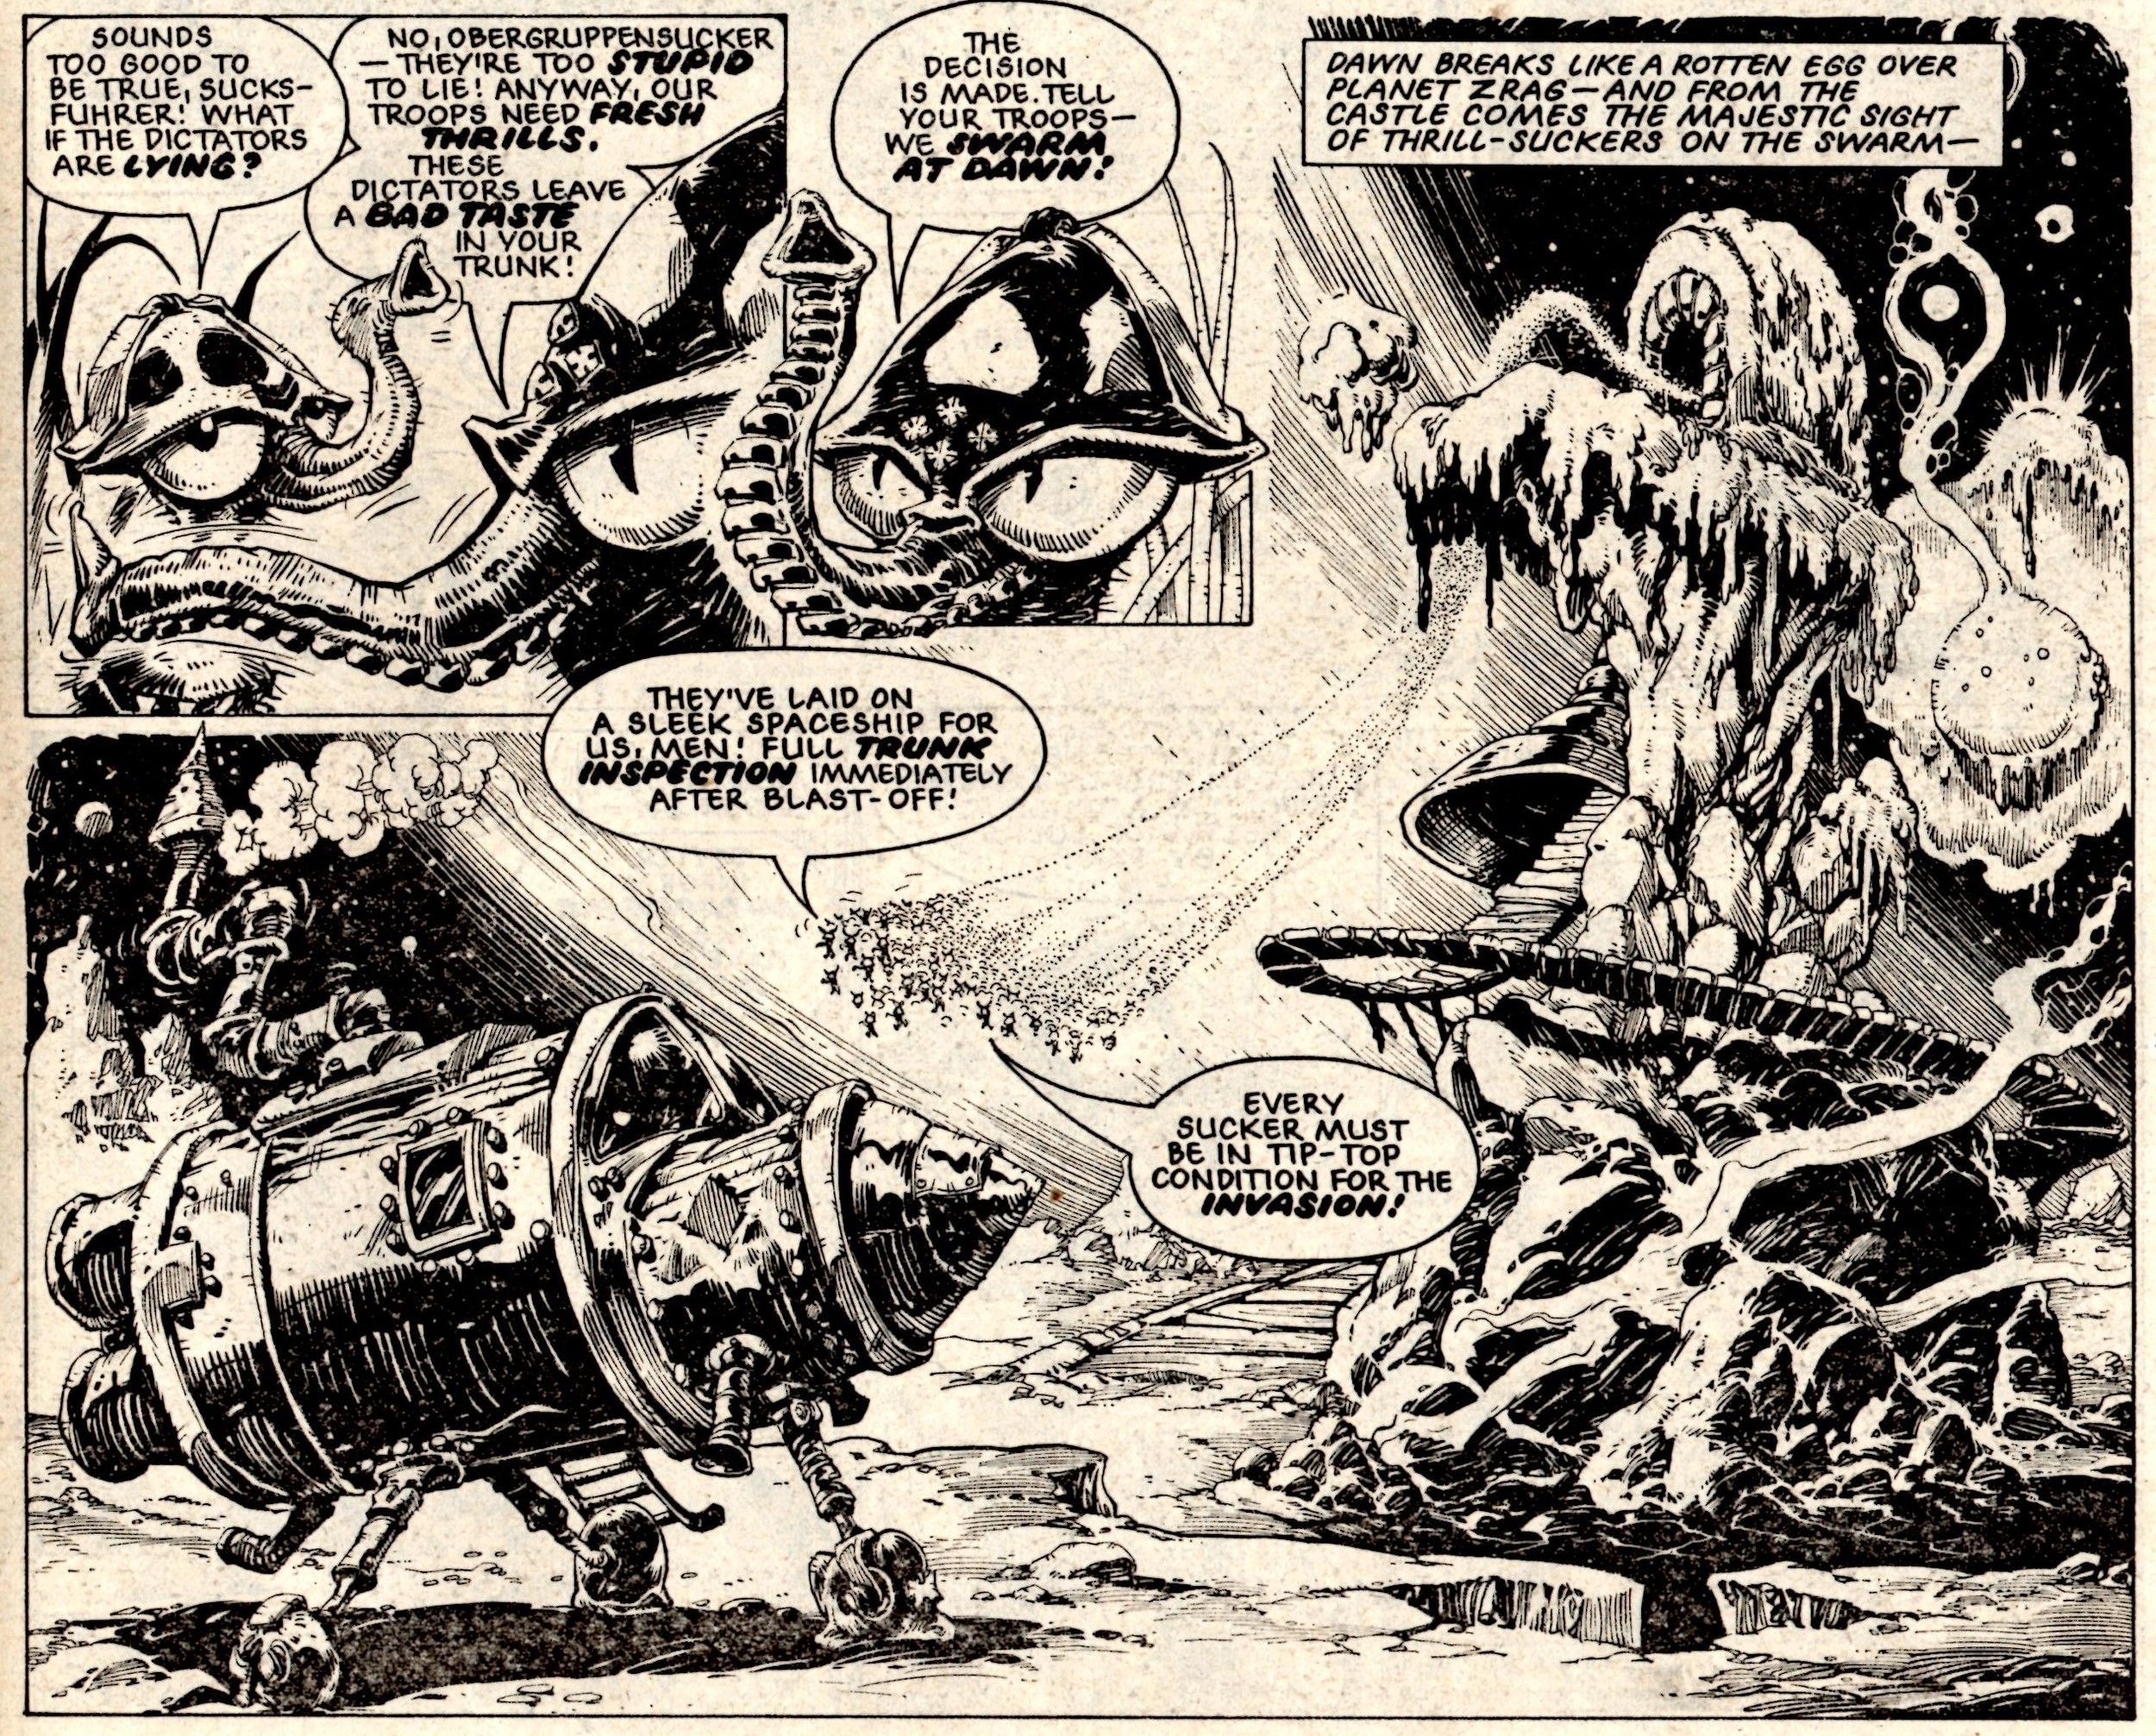 Invasion of the Thrill-snatchers: Massimo Belardinelli (artist)